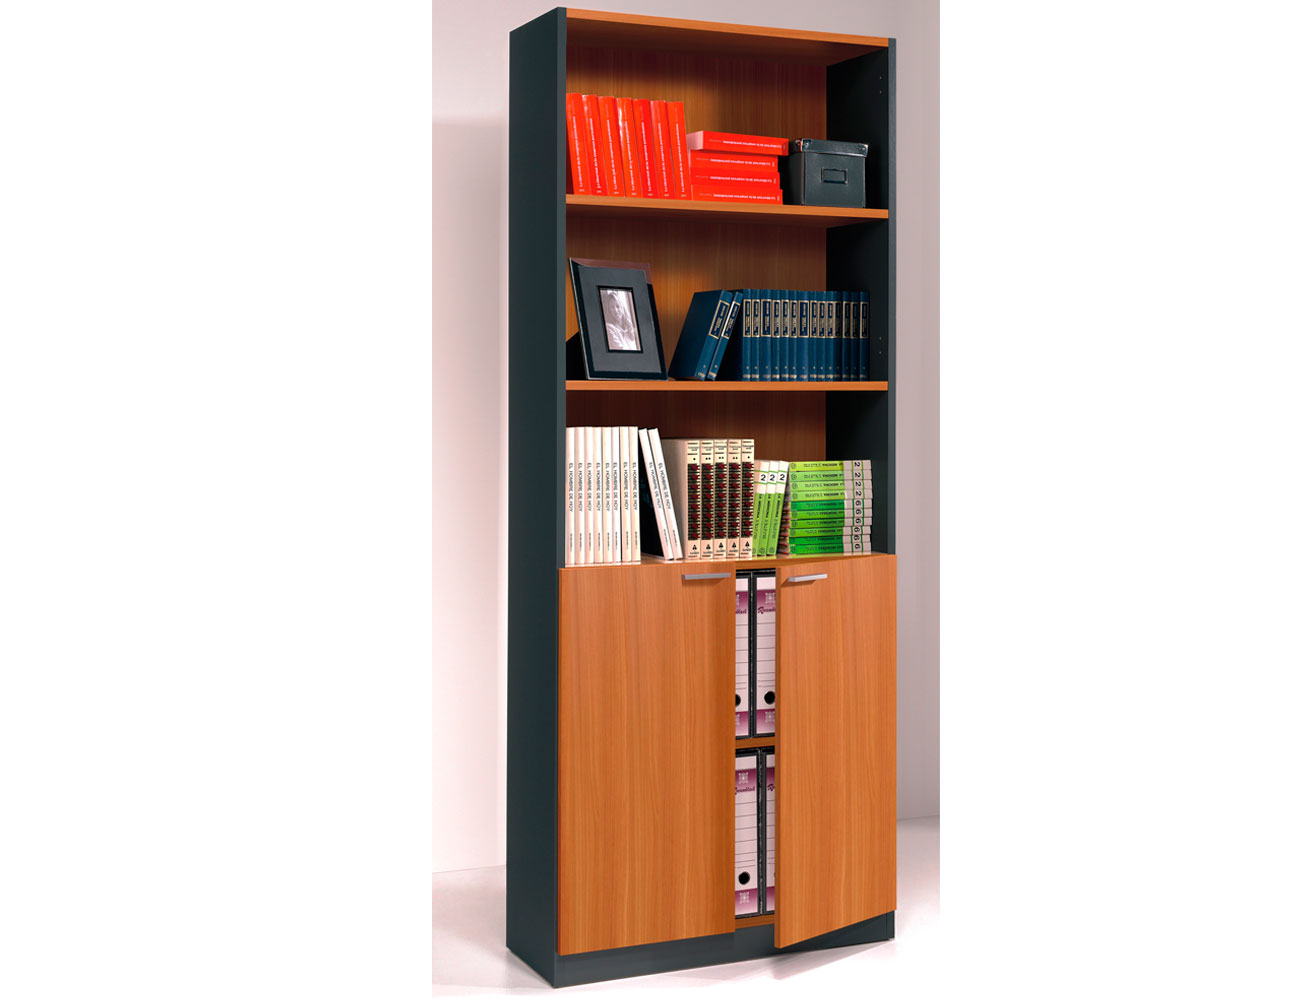 Libreria estanteria oficina despacho grafito nogal 2 puertas